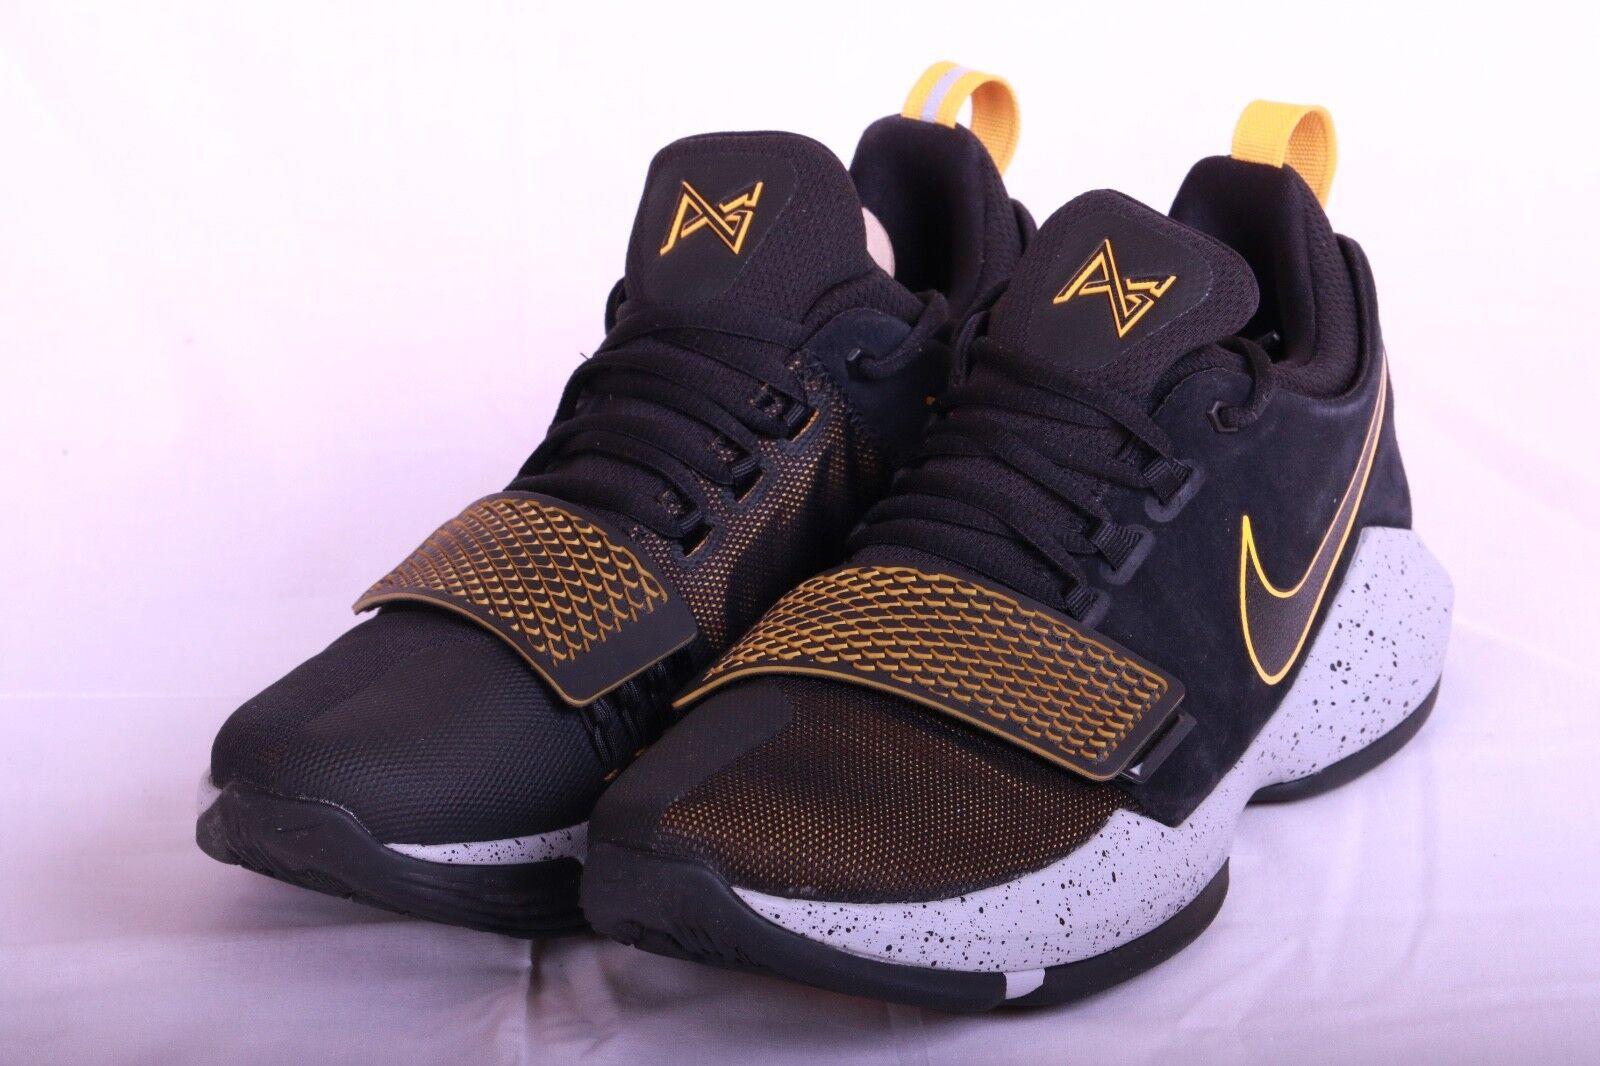 b729463cfe Nike PG 1 Mens Black Grey University gold Basketball shoes 878627 006 Size  7.5